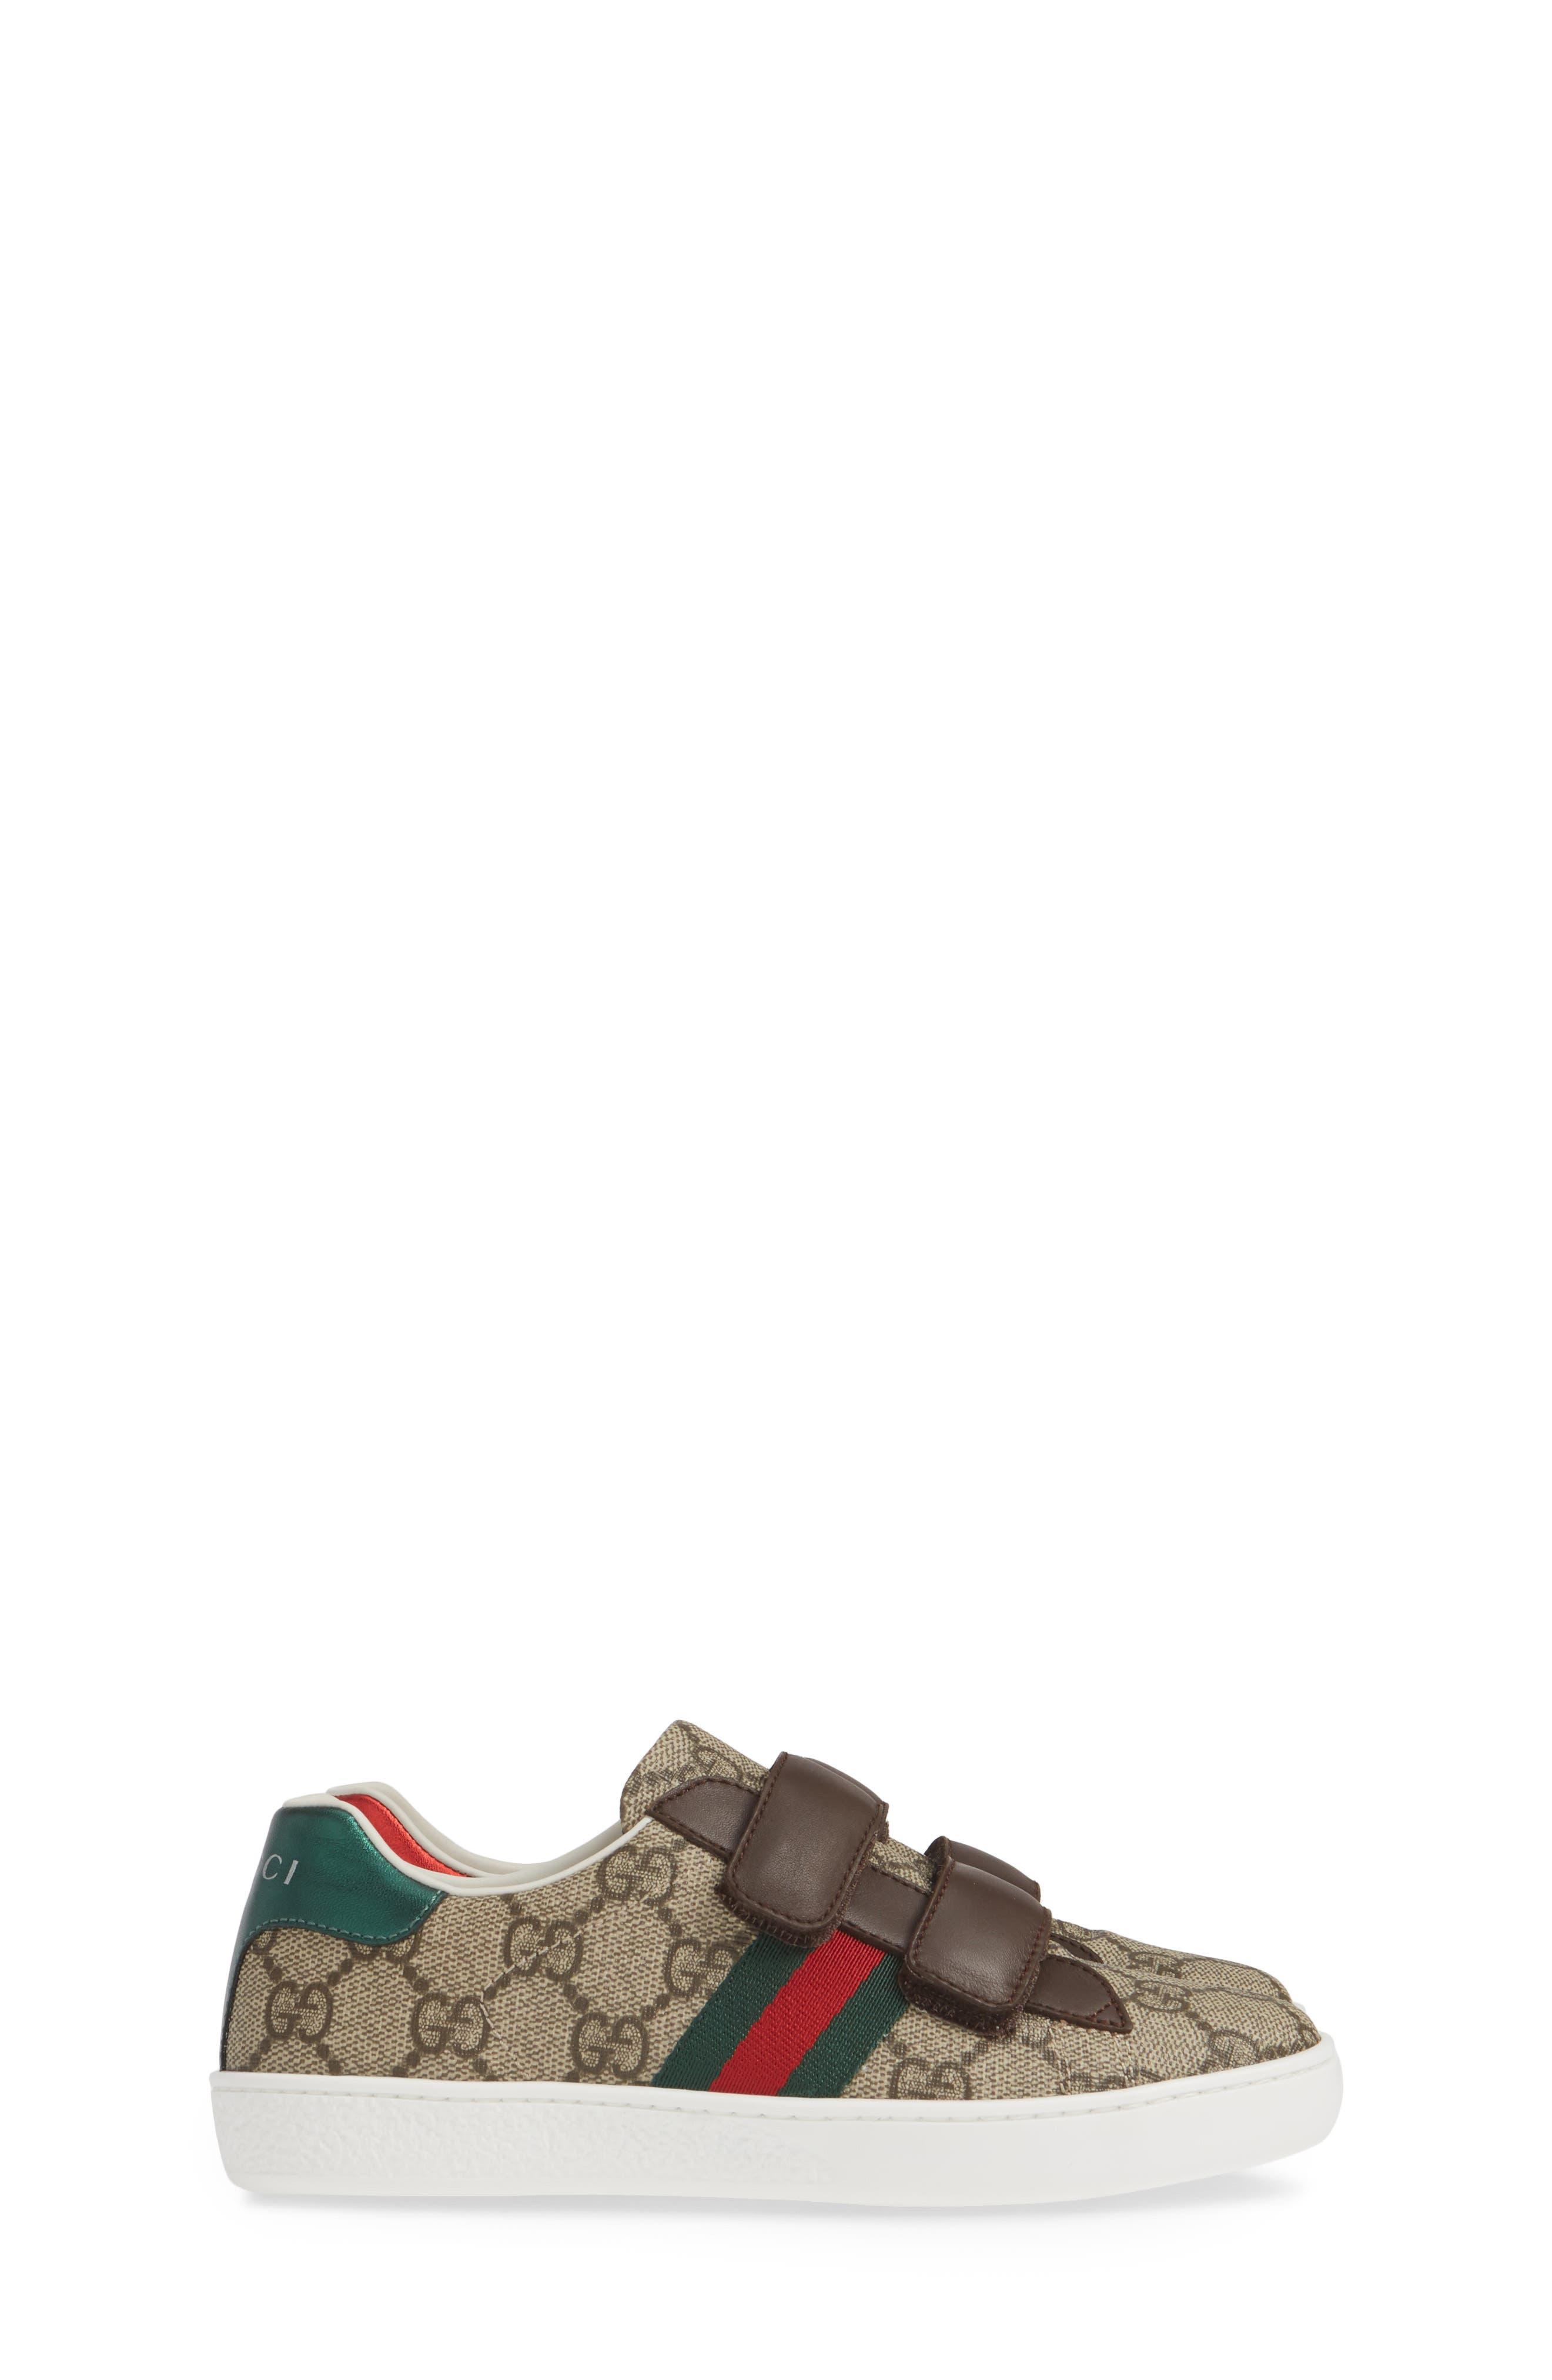 GUCCI, New Ace Monogram Sneaker, Alternate thumbnail 4, color, BEIGE